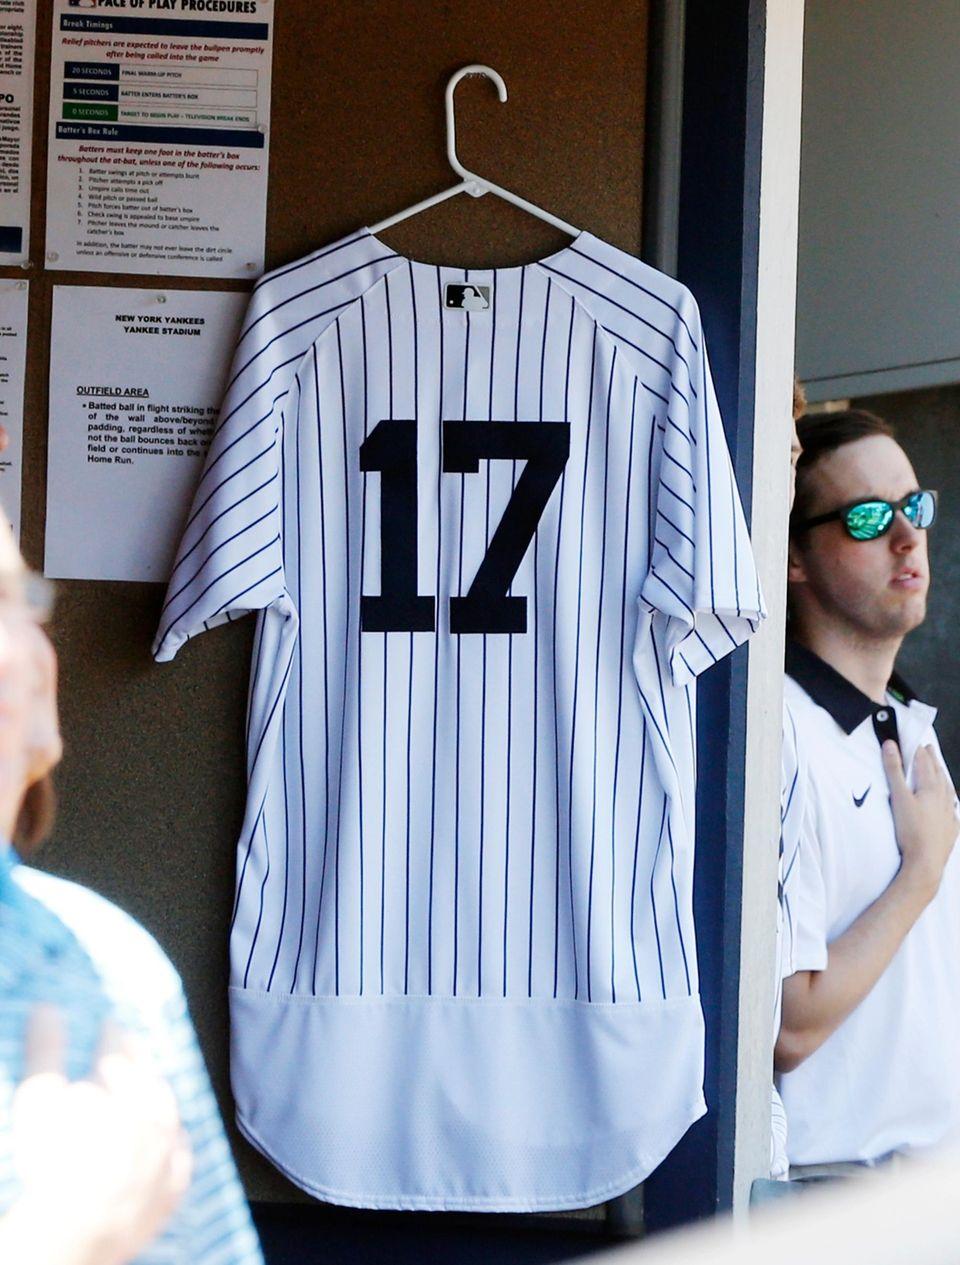 The uniform of the late Gene Michael hangs